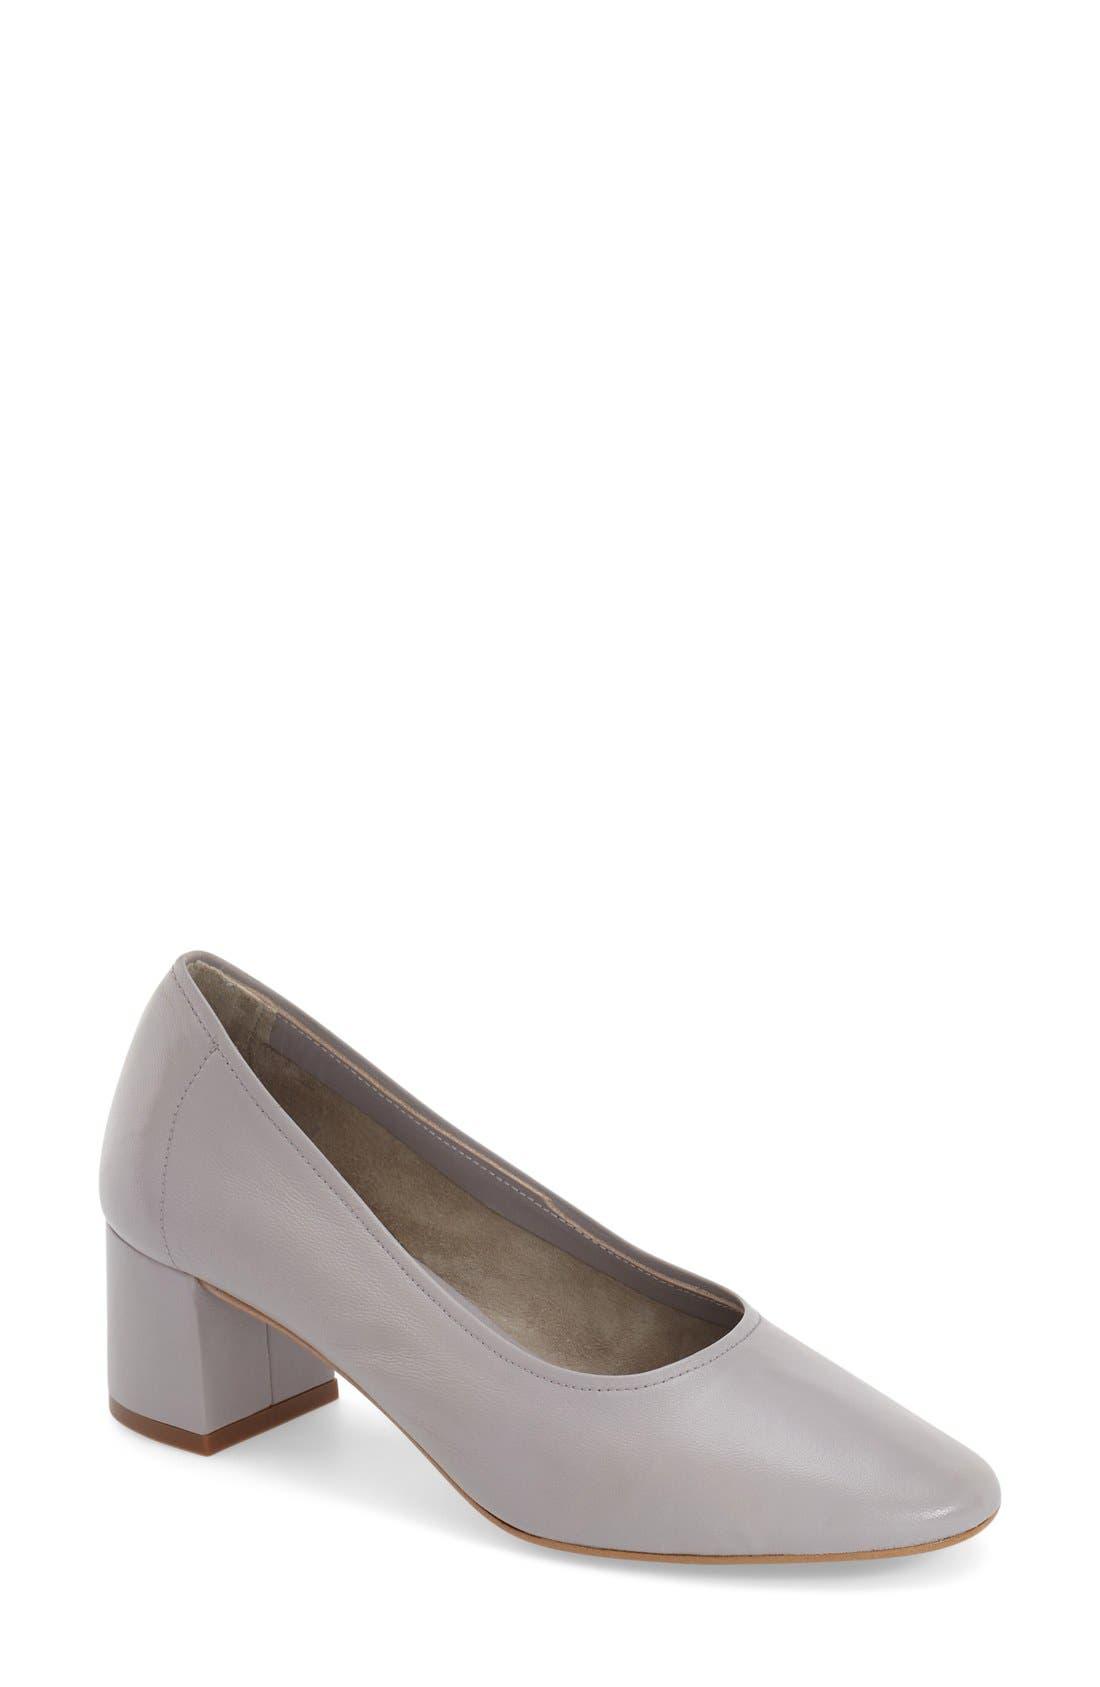 'Juno' Ballet Shoe,                             Main thumbnail 3, color,